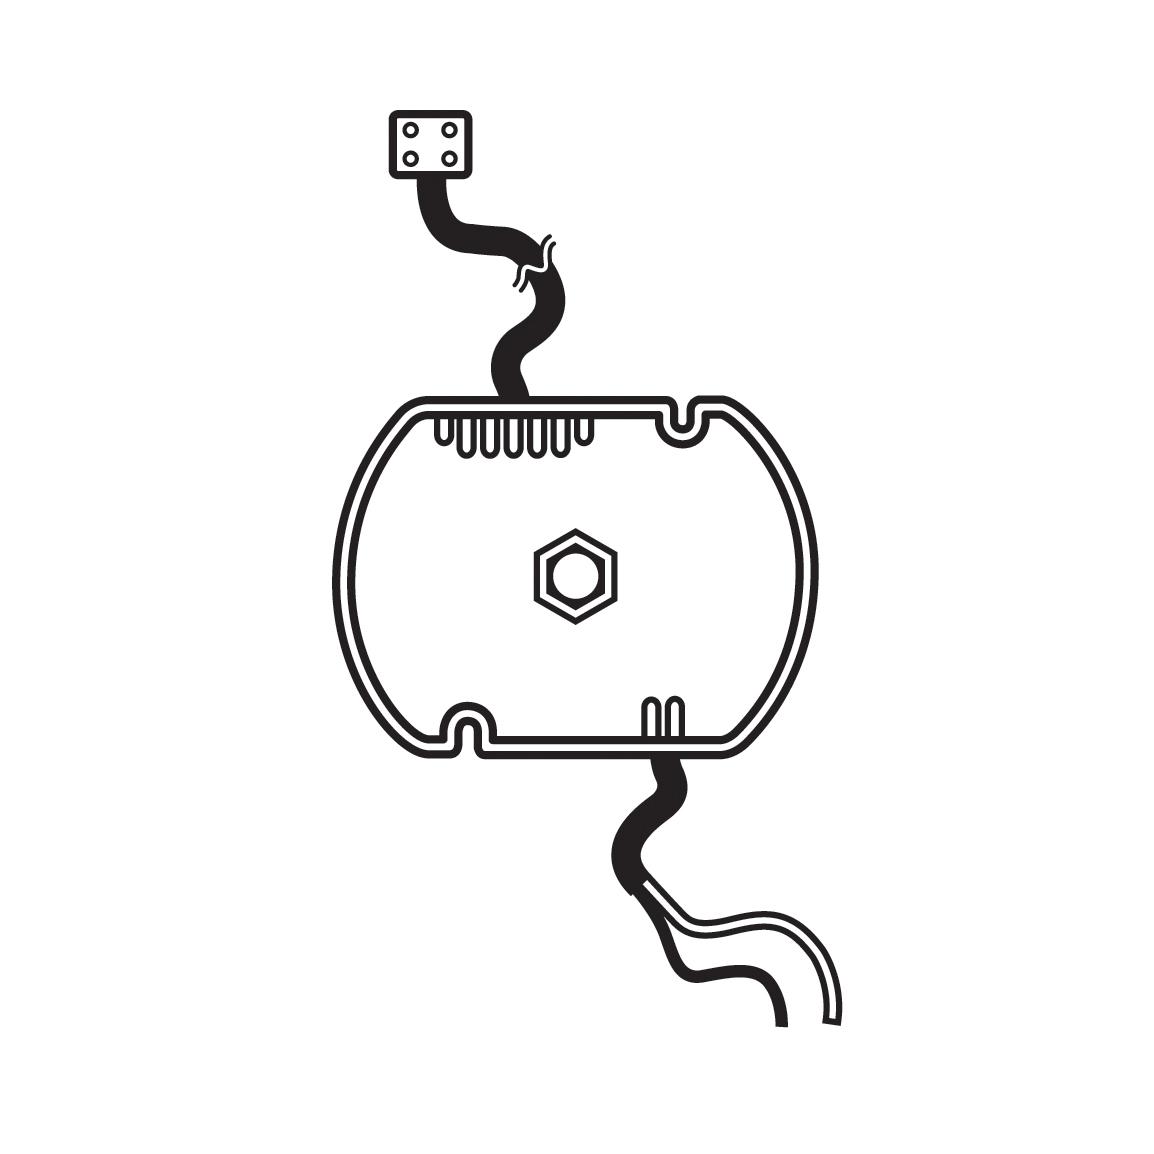 Kichler Ballast Fluor Circline 55W White 4035 From